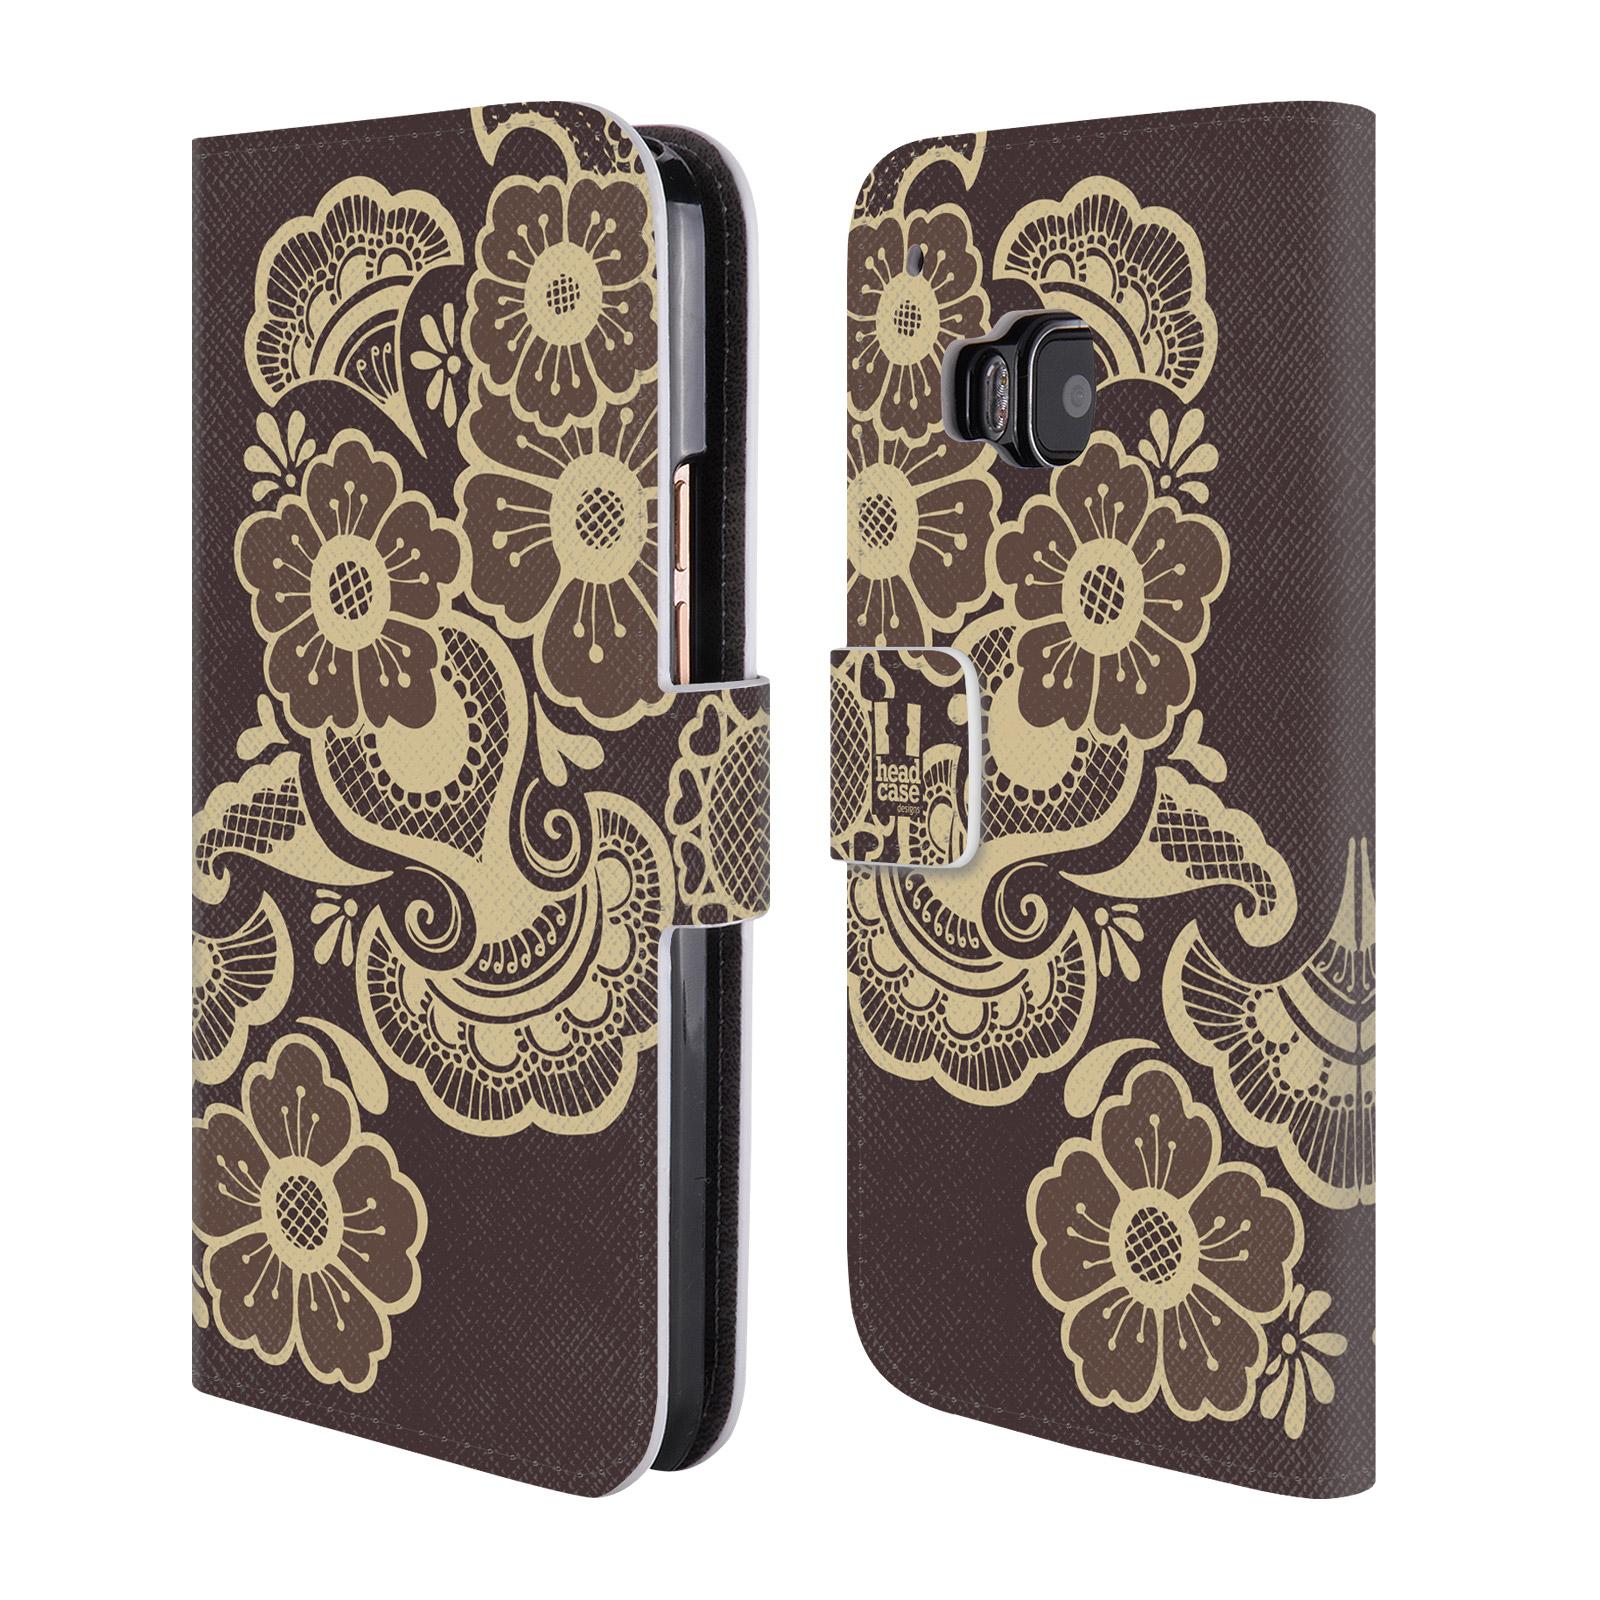 head case henna brieftasche handyh lle aus leder f r htc phones 1 ebay. Black Bedroom Furniture Sets. Home Design Ideas